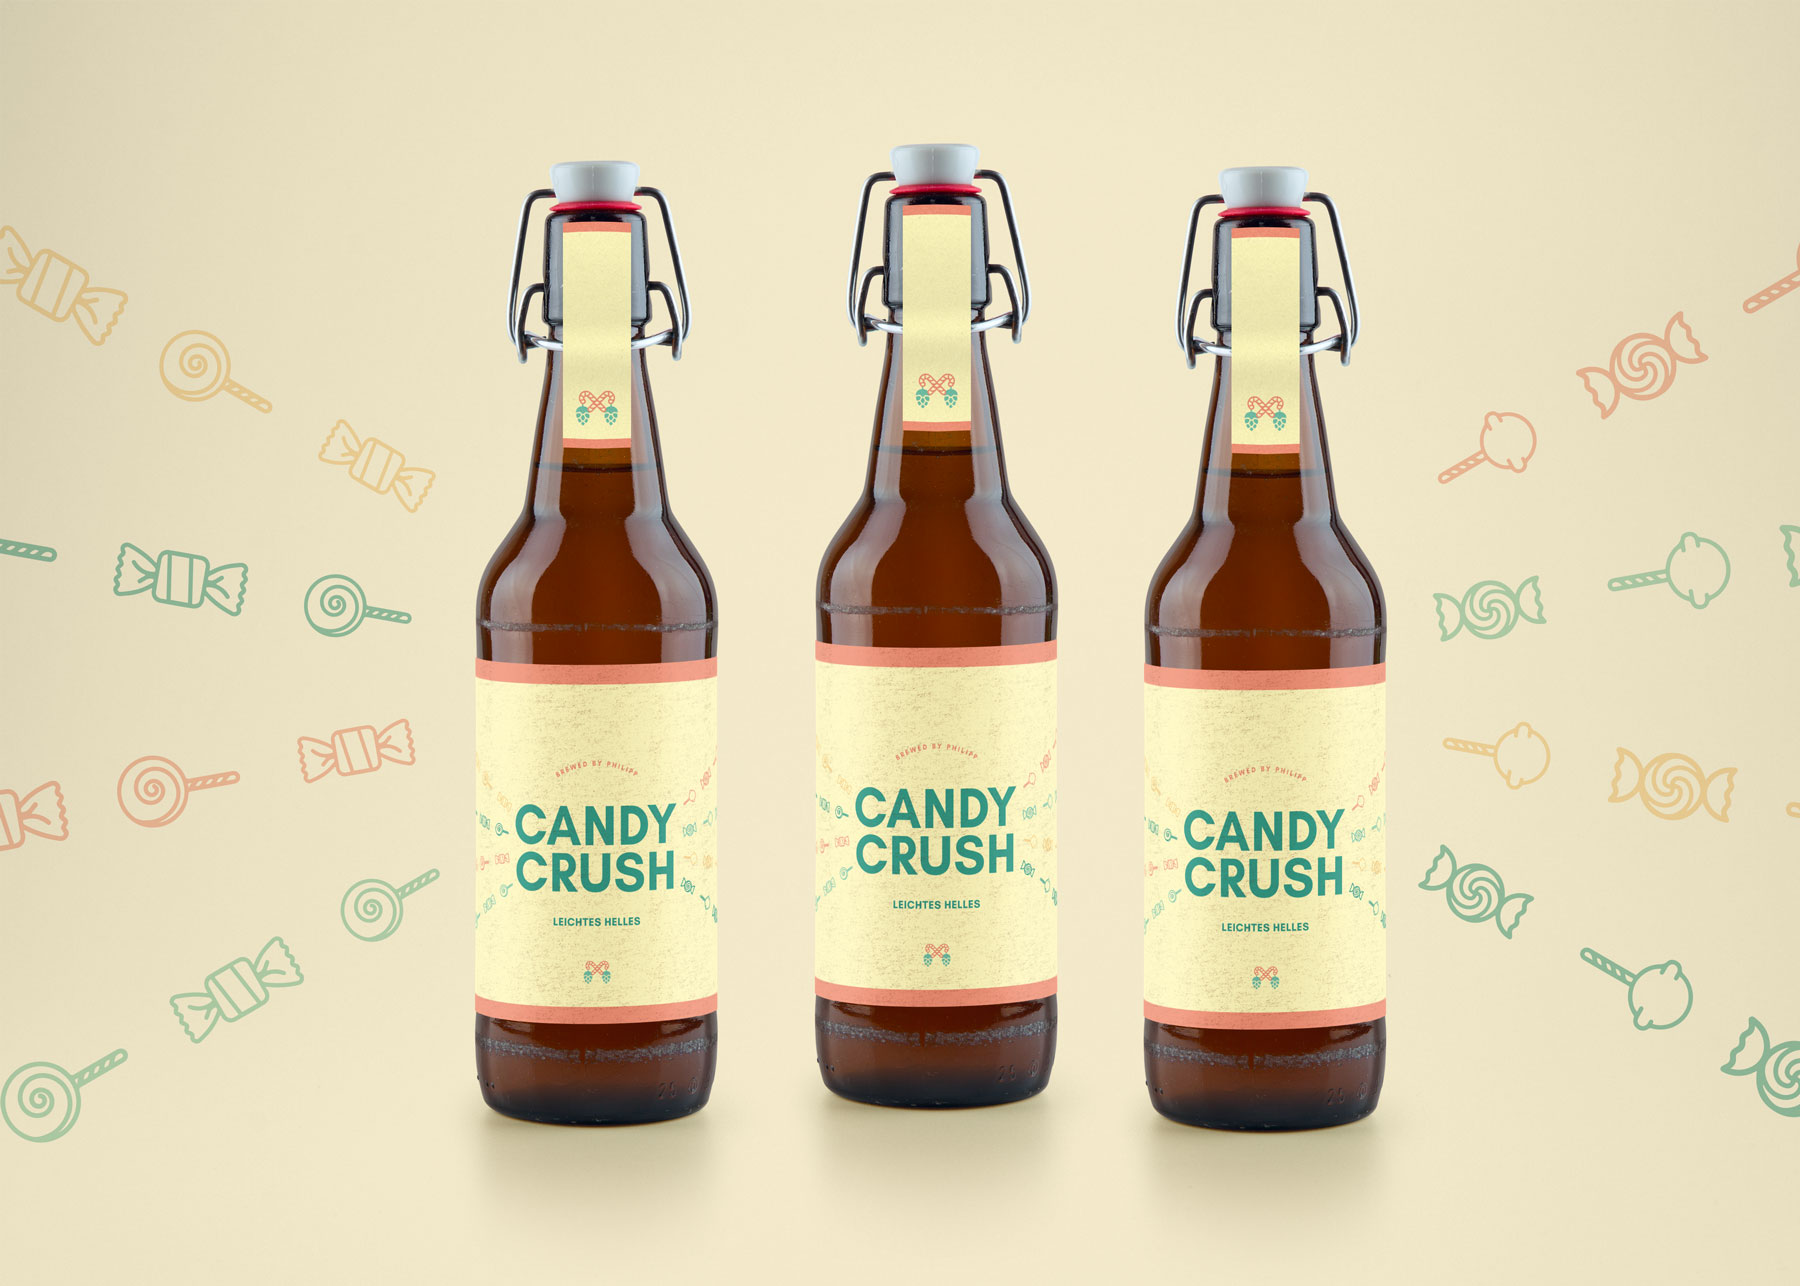 beer-packaging-design-candy-crush-by-max-duchardt-maax-berlin-ganz